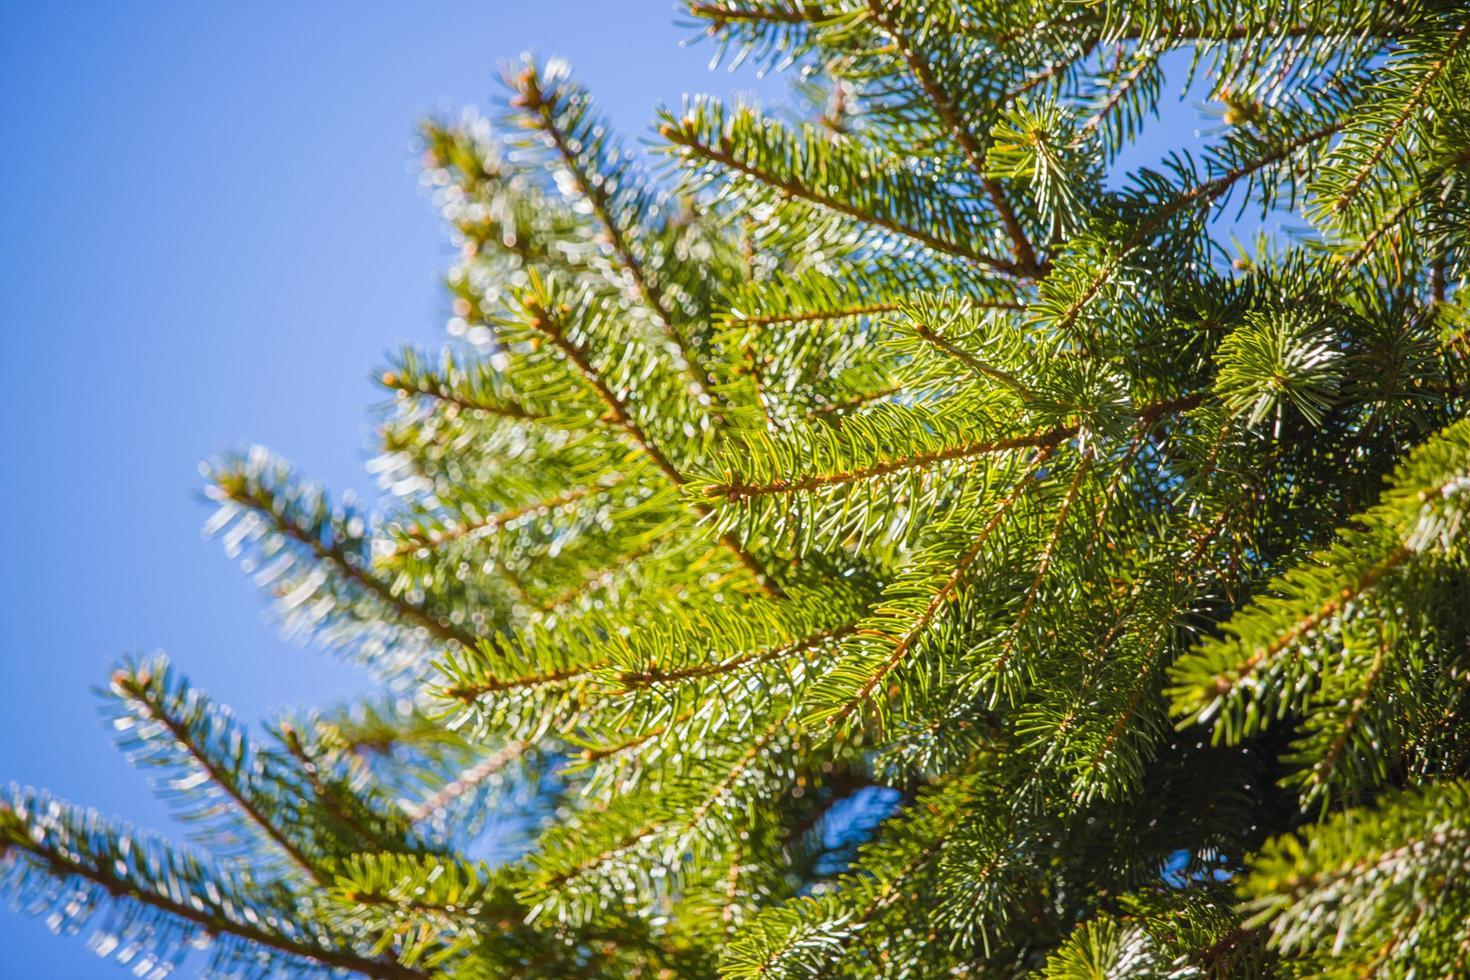 grünblättriger Baum foto